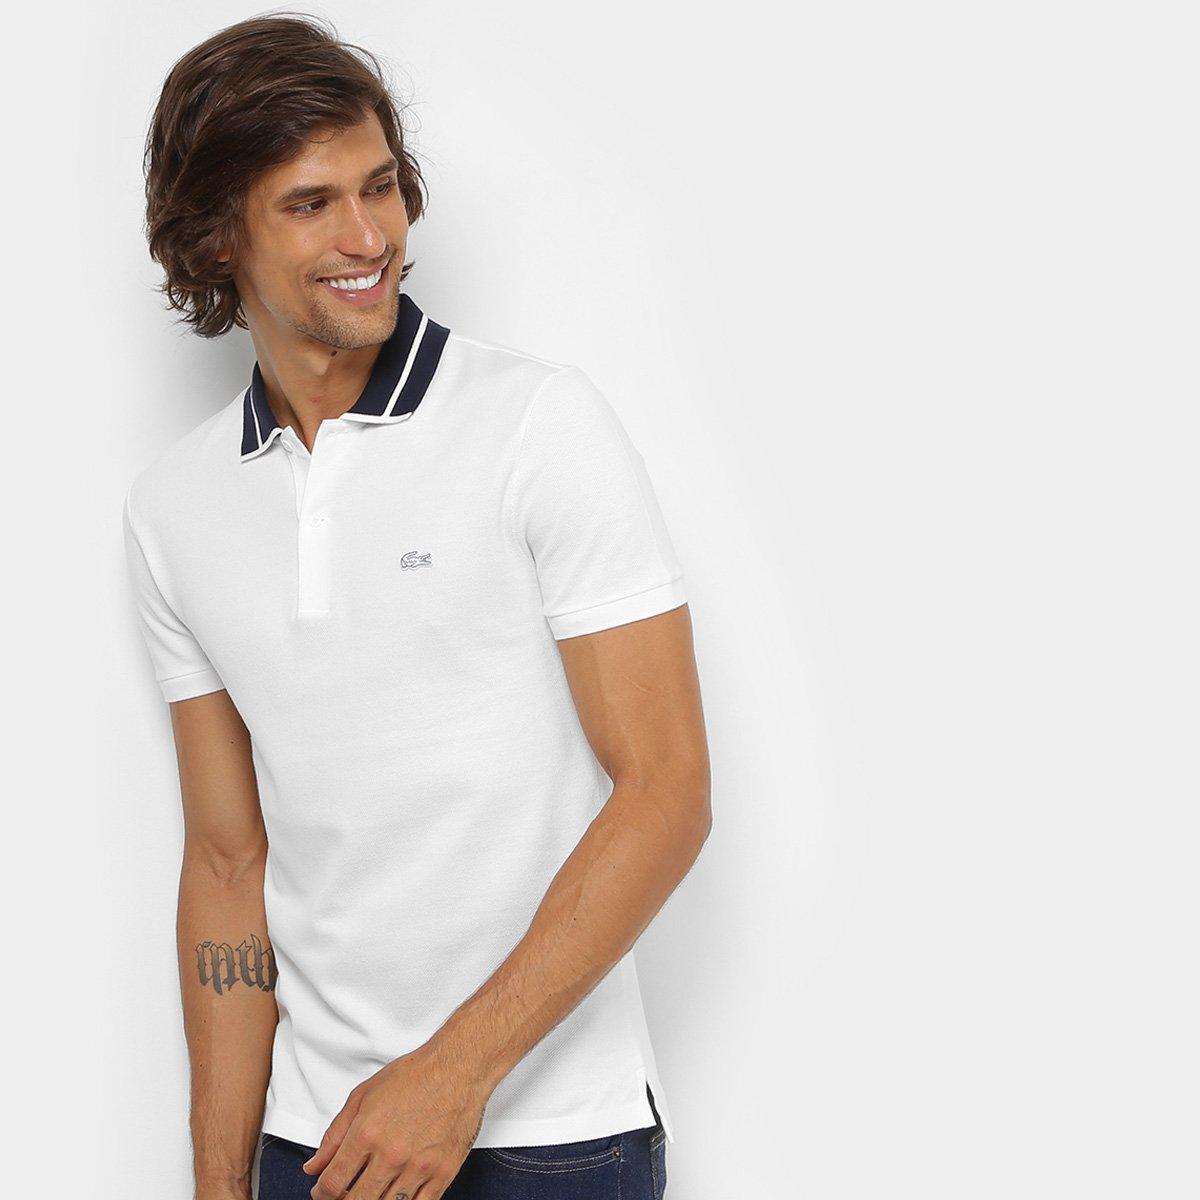 fe3b97e5ec963 Camisa Polo Lacoste Piquet Slim Fit Fancy Contraste Masculina - Compre Agora